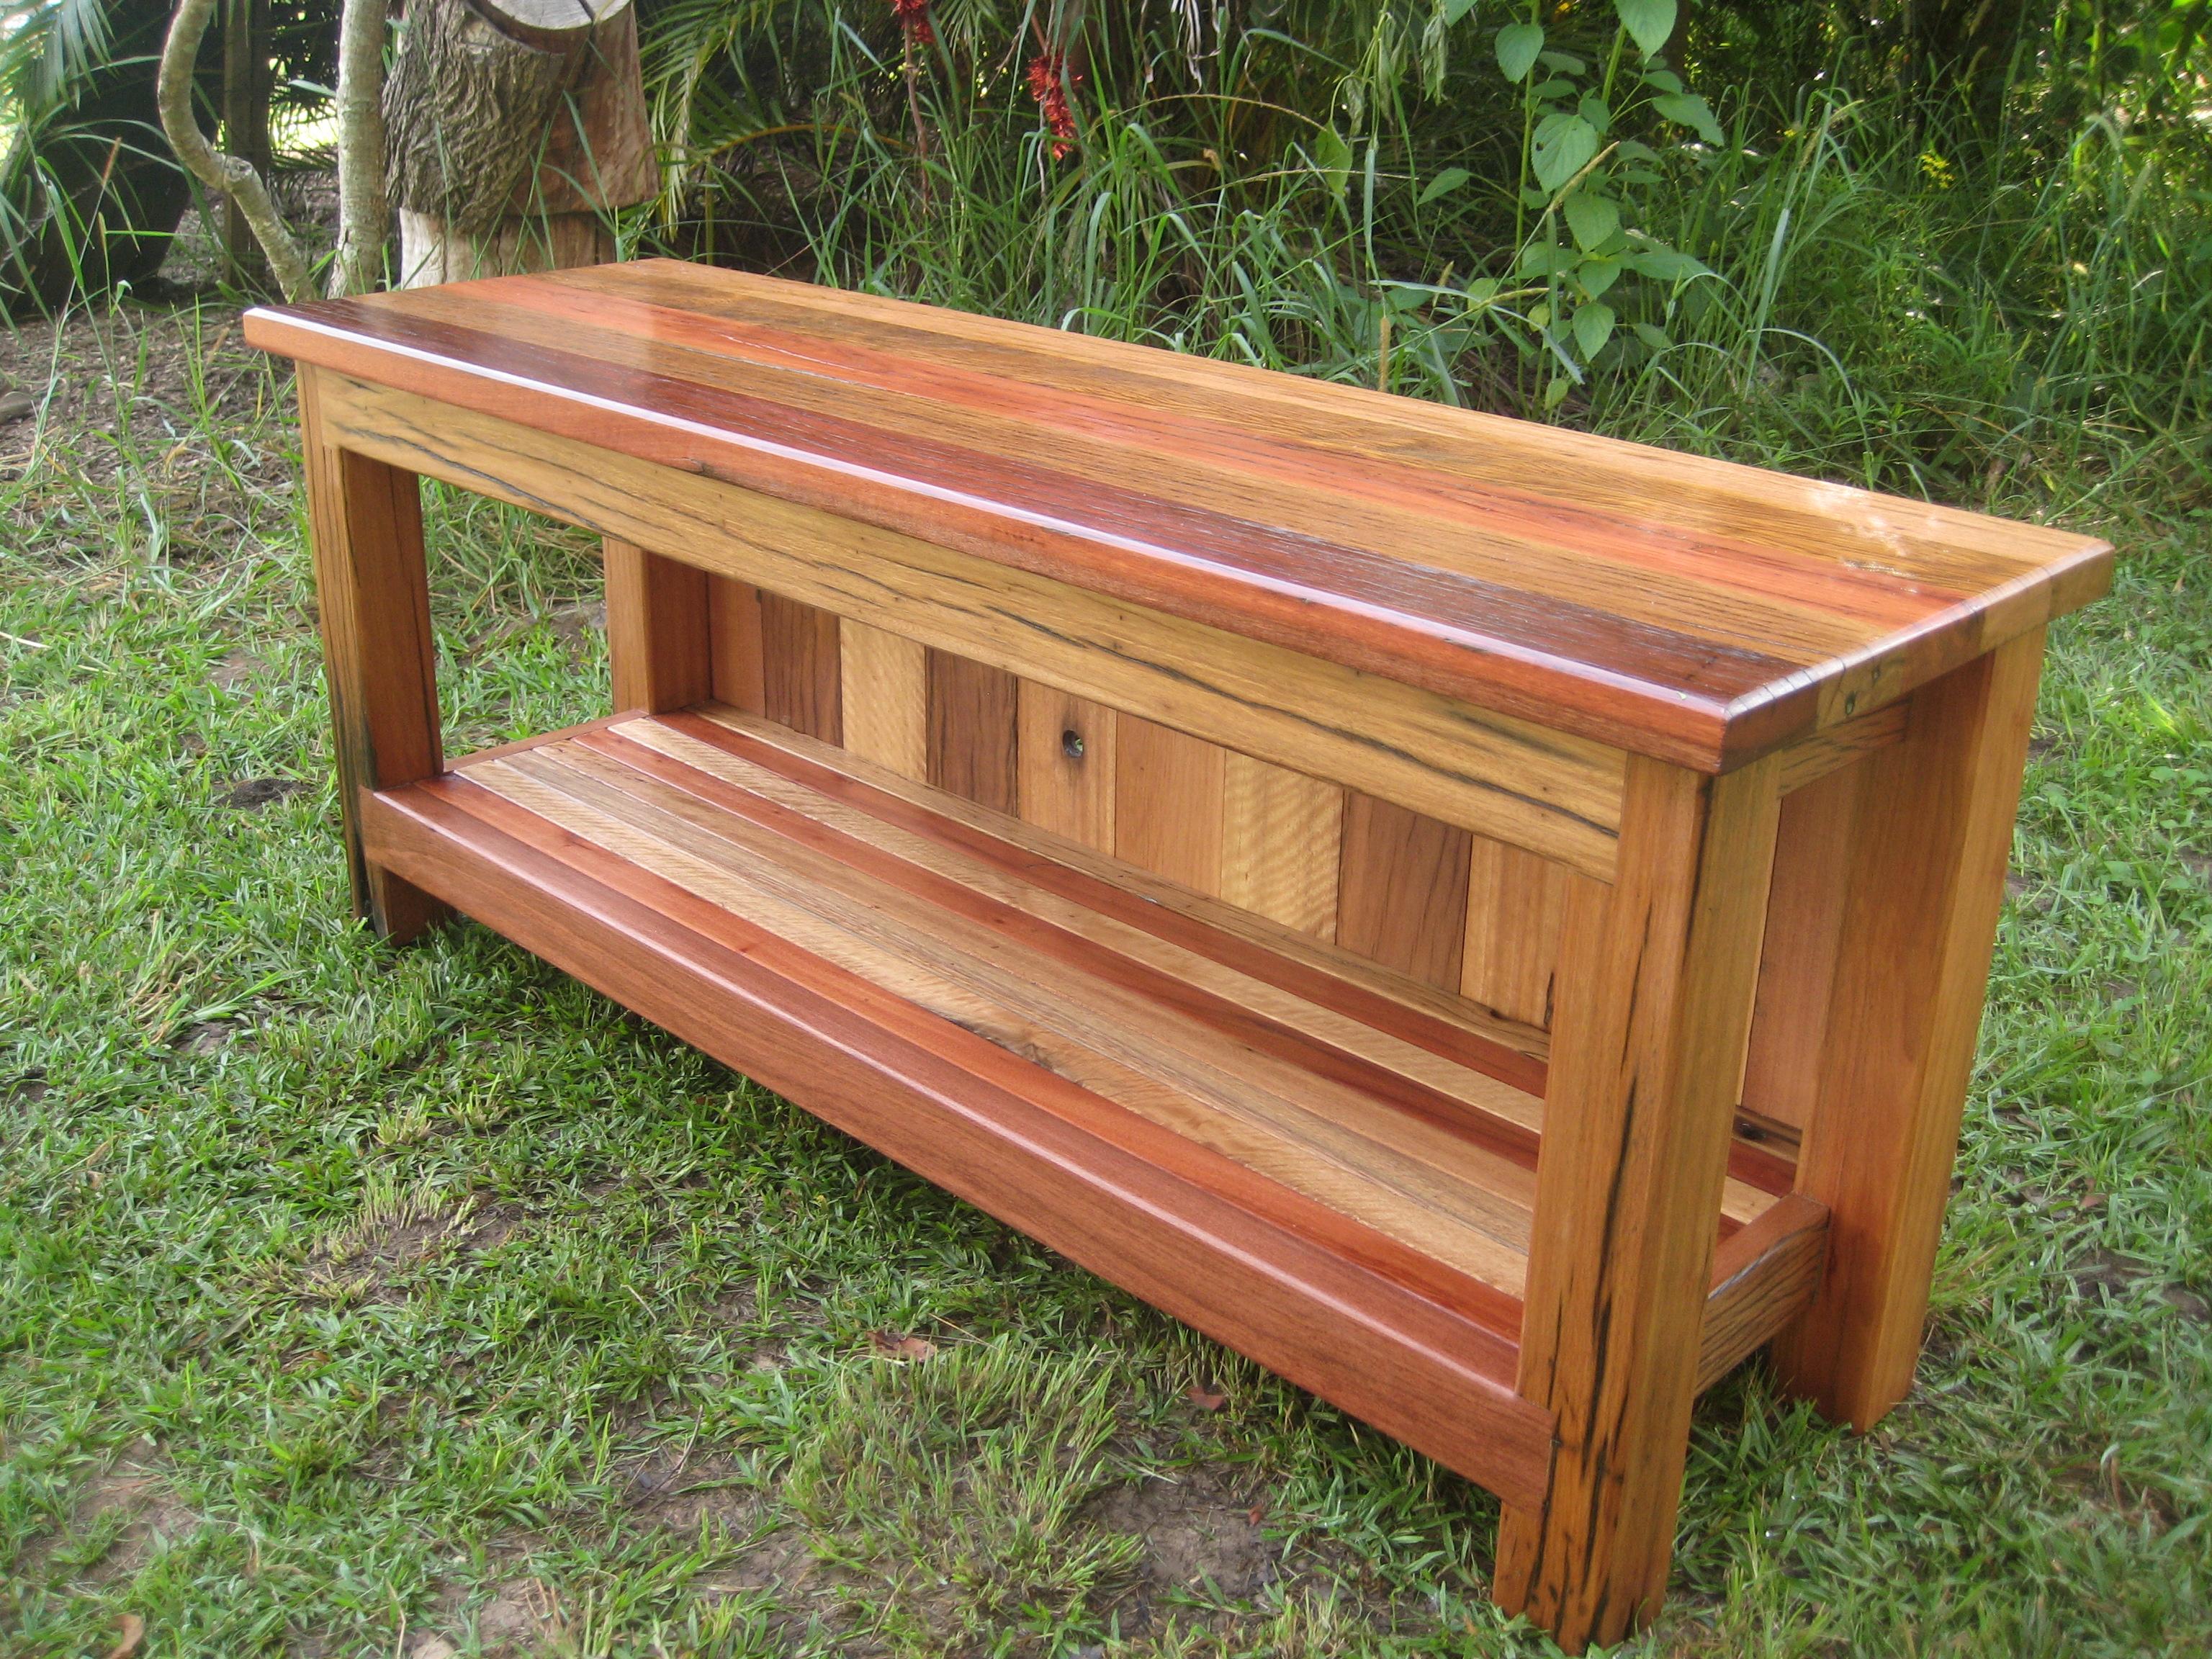 Bridge Beautys Handcrafted Reclaimed Timber Furniture